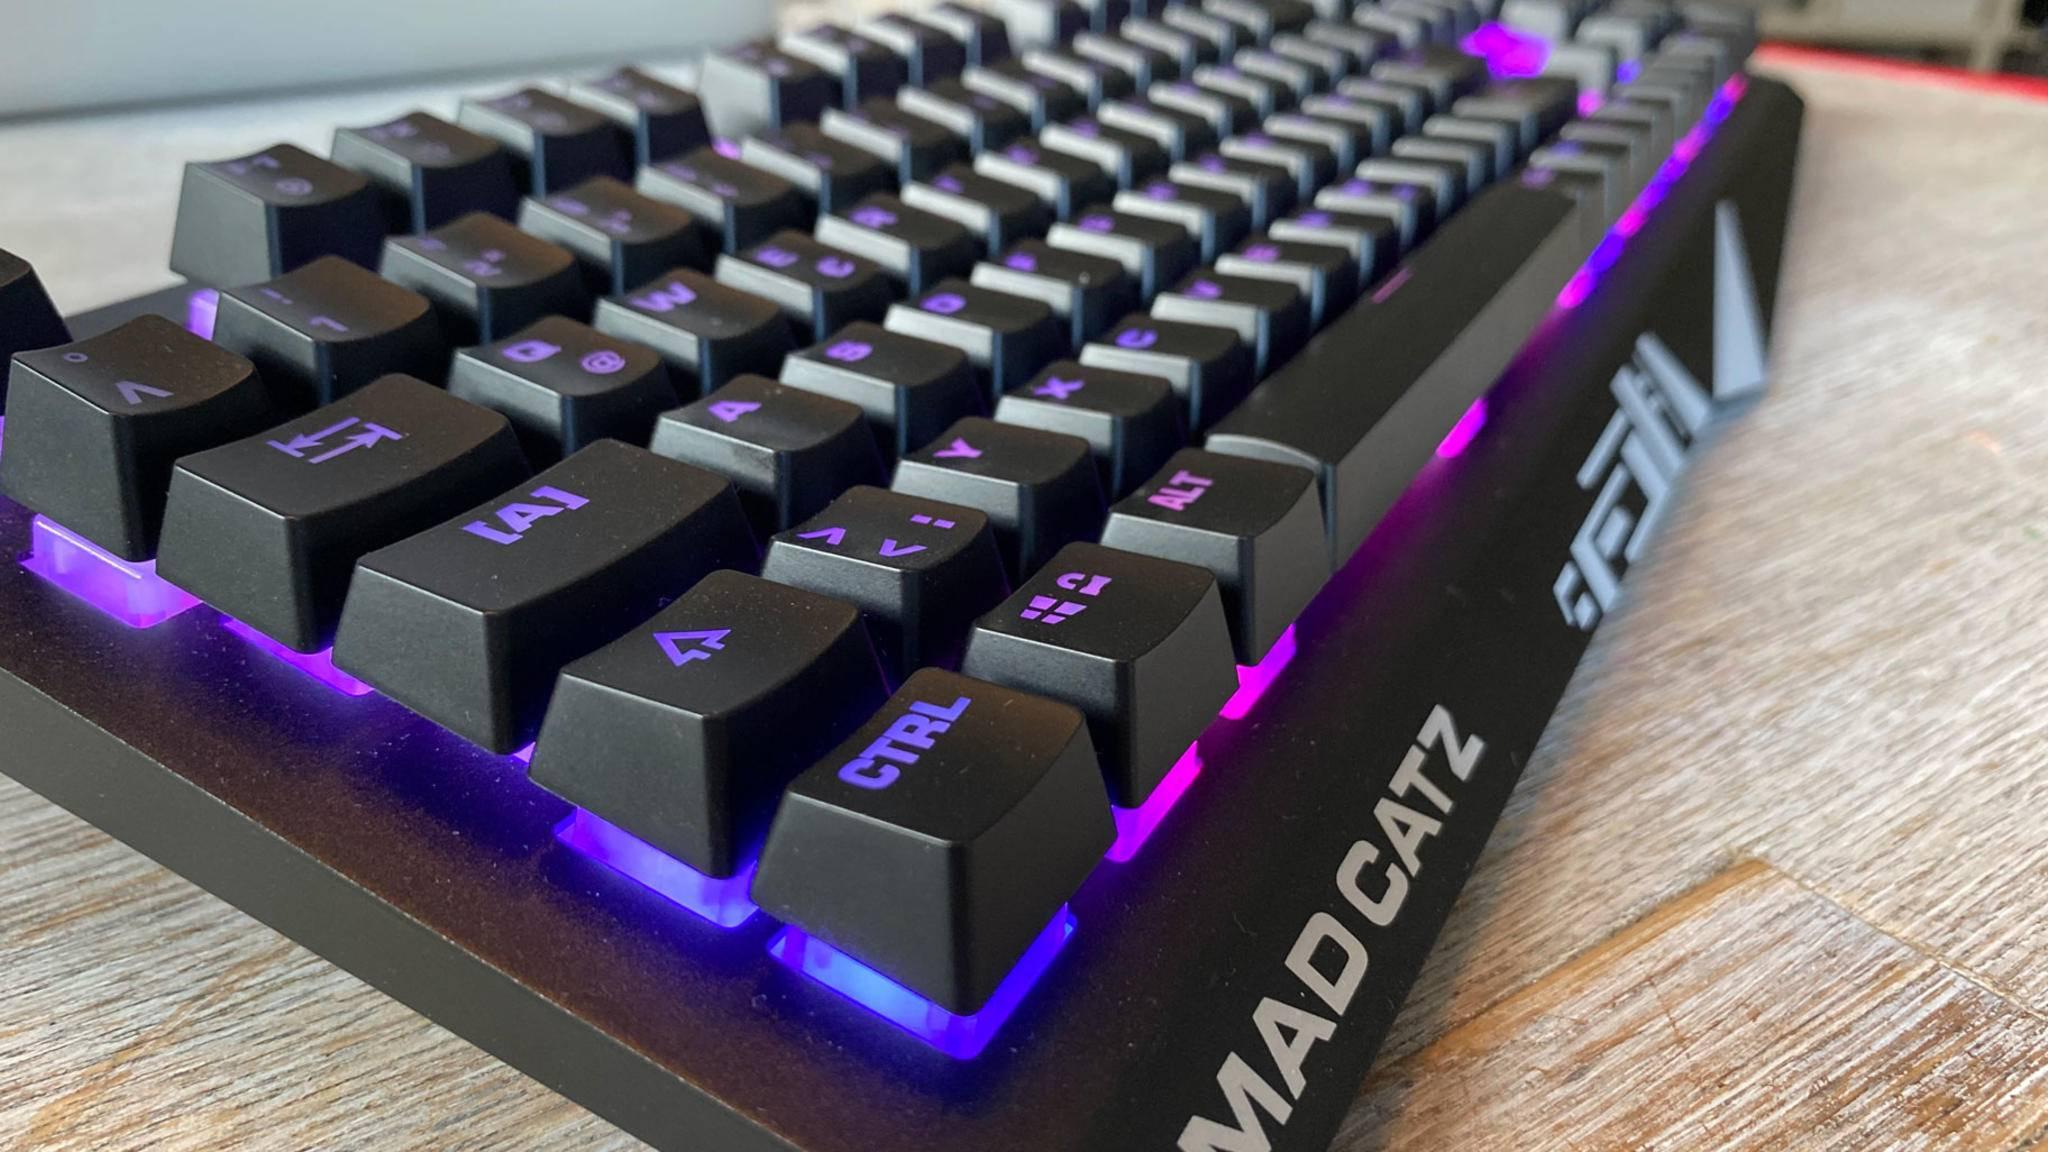 mad-catz-strike-2-gaming-keyboard-02